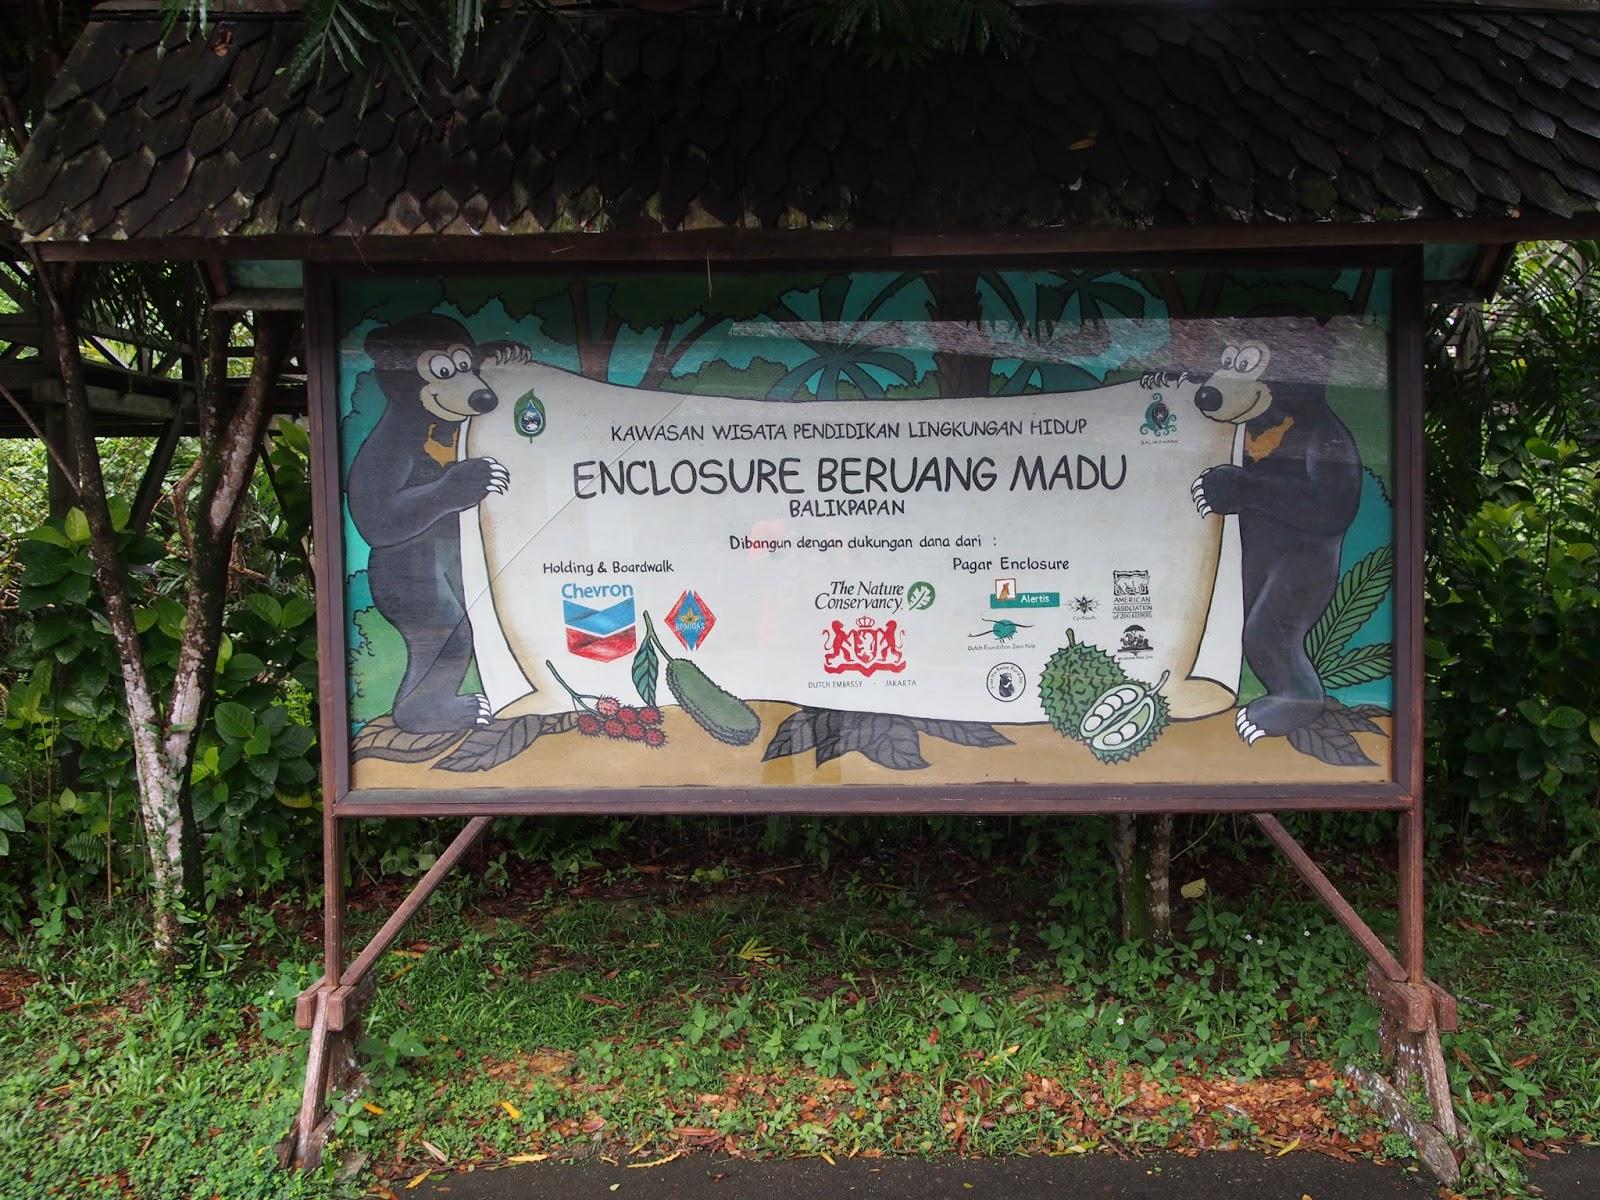 Carl Fakaruddin Wisata Gratis Beruang Madu Di Balikpapan